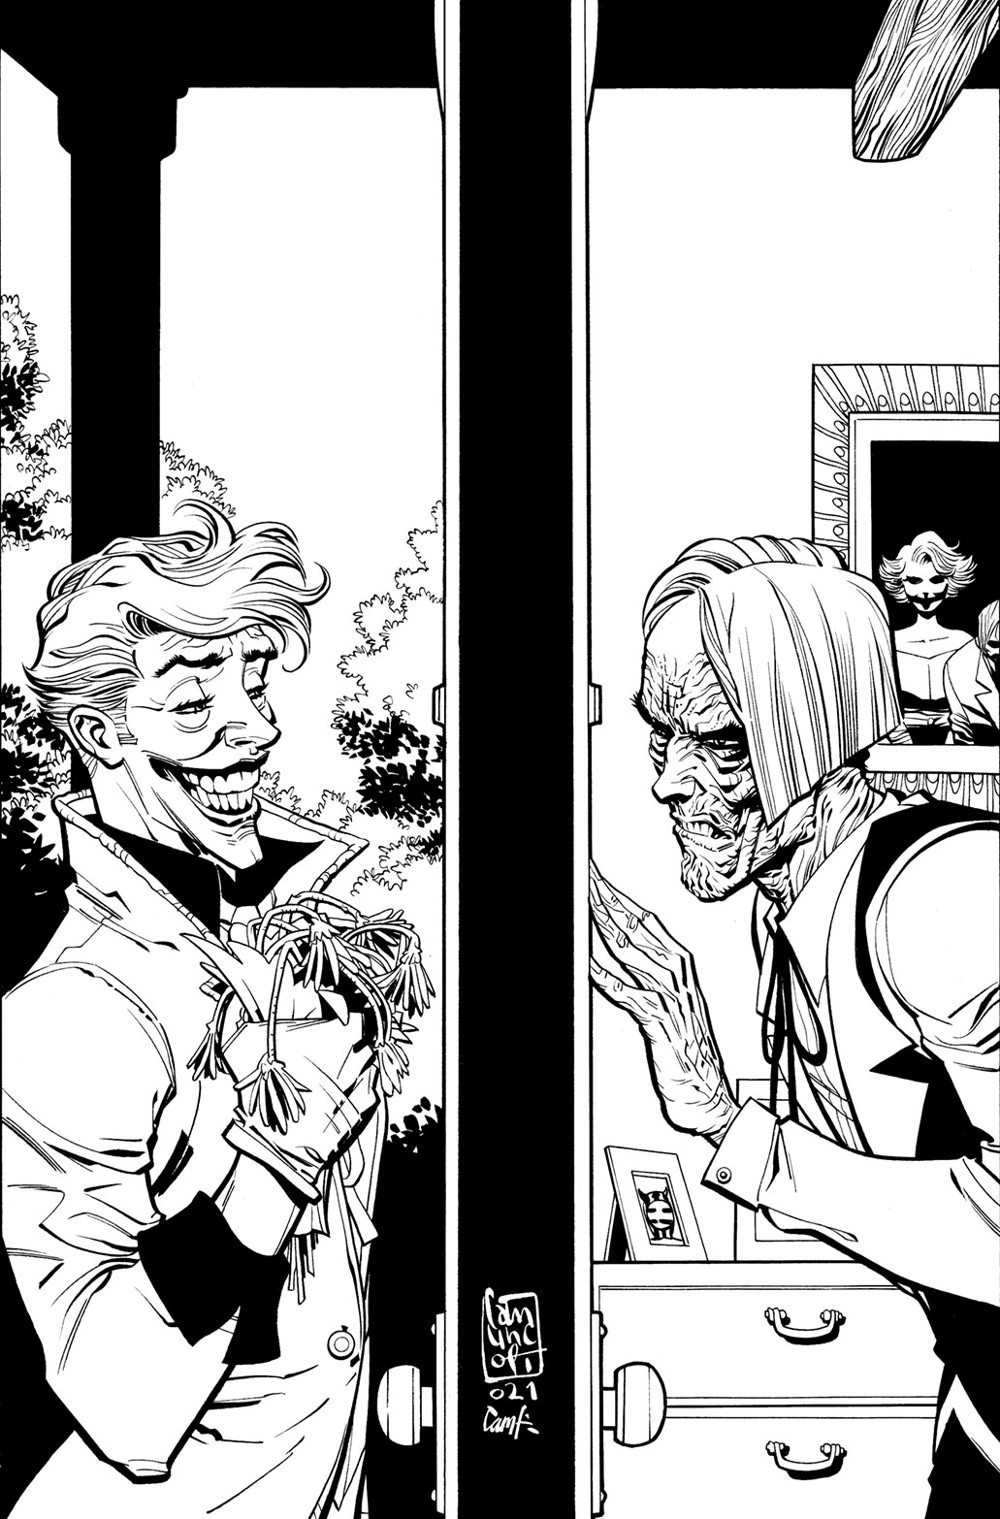 Joker_Cv11_Main_Cover_Inks DC Comics December 2021 Solicitations